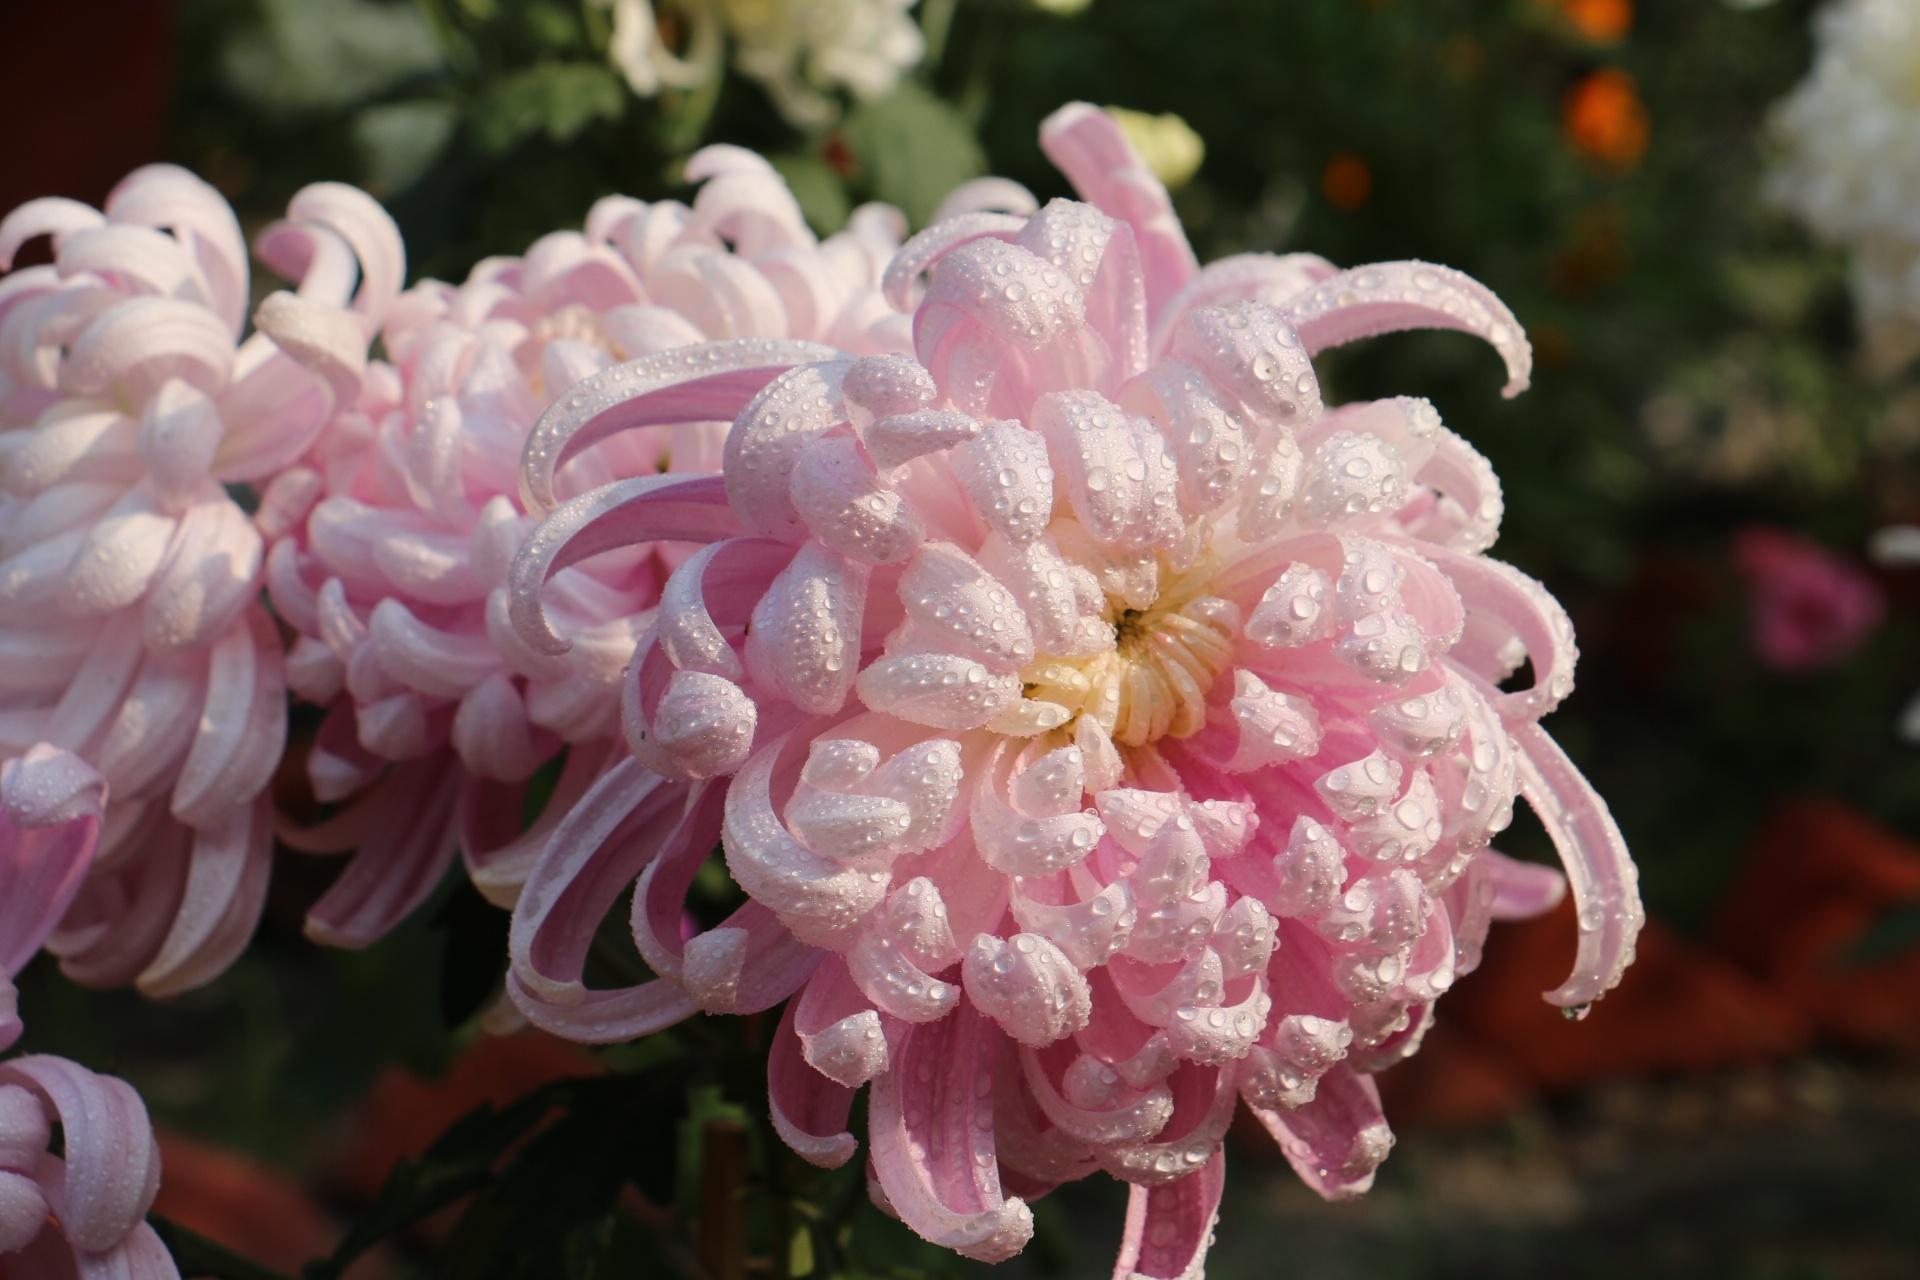 dewdrops on crysynthemum by Sanjeev Joshi